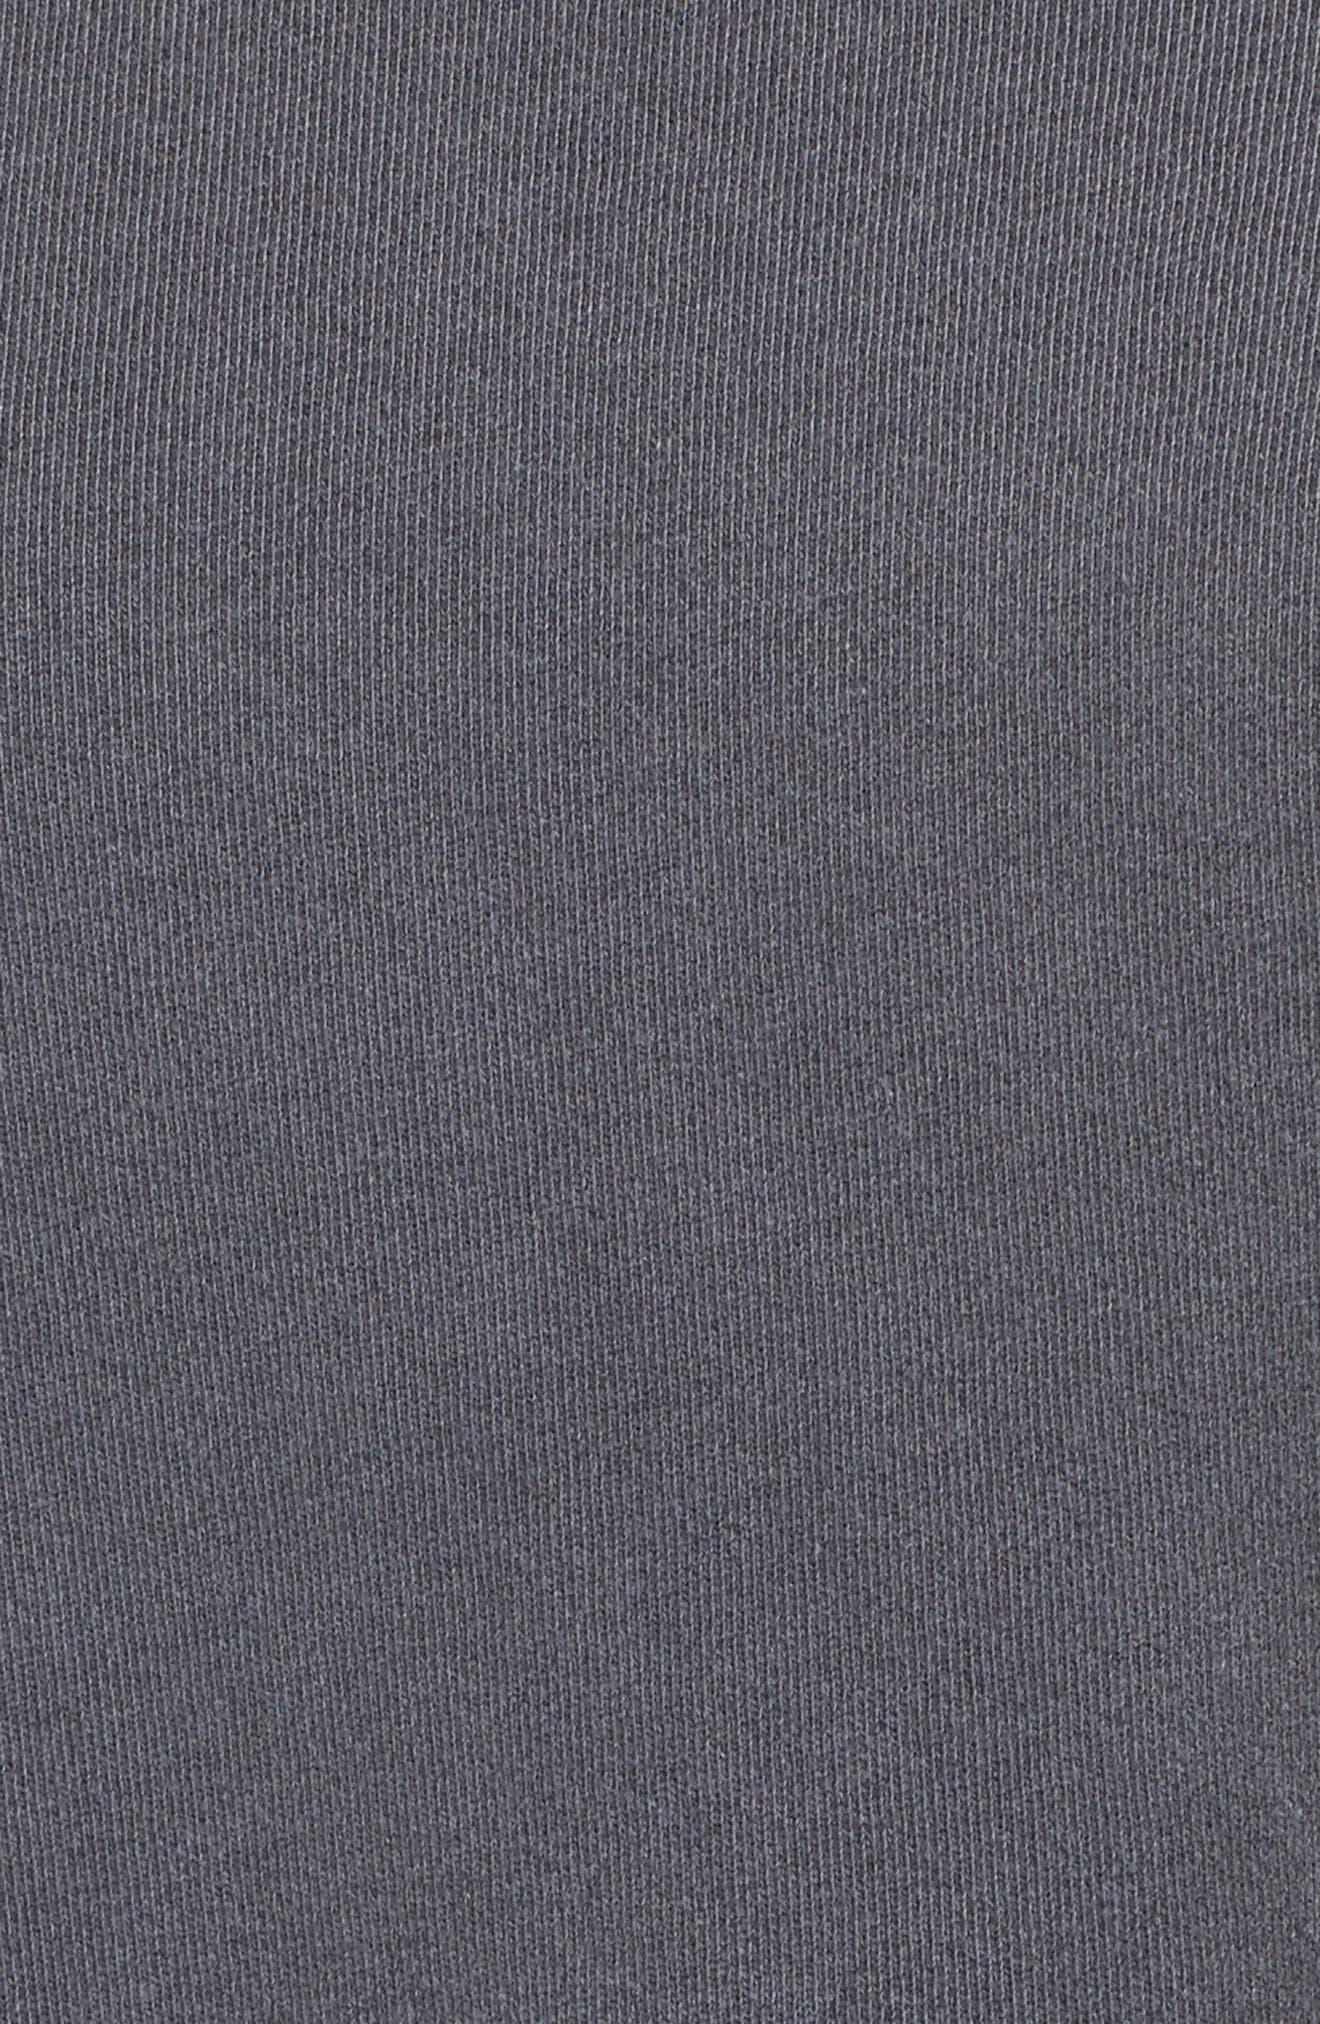 Mixed Media Swing Sweatshirt,                             Alternate thumbnail 5, color,                             Charcoal